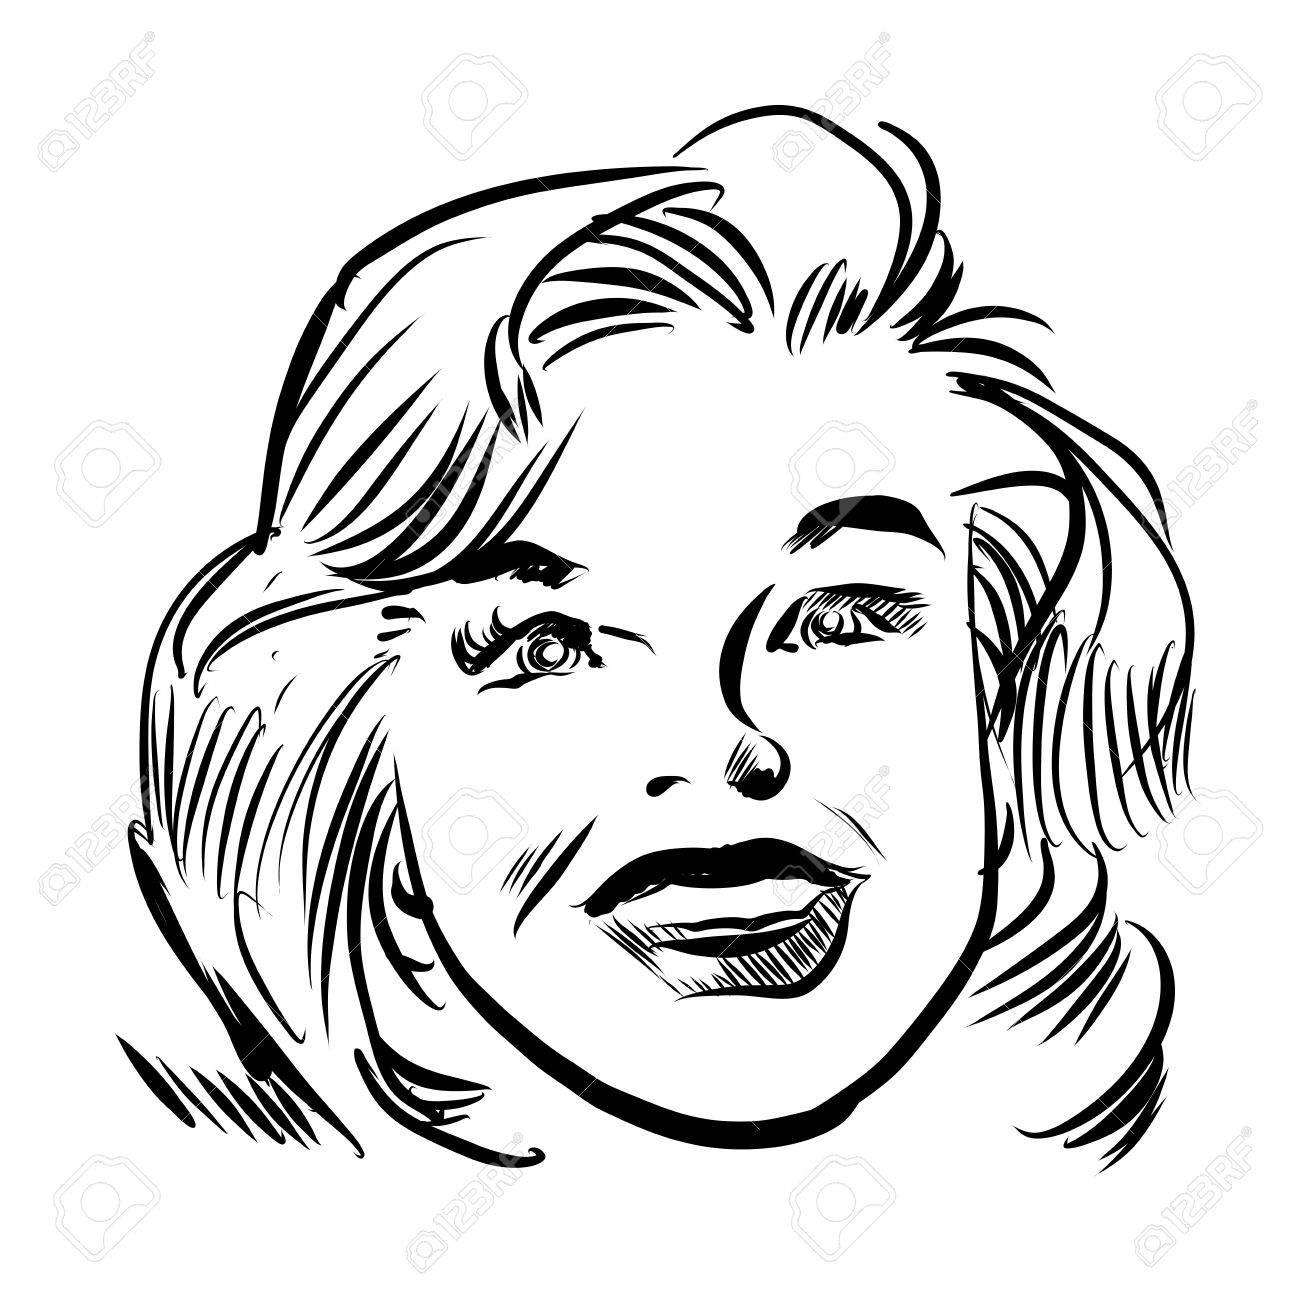 1300x1300 Vintage Talking Woman Portrait, Hand Drawn Comic Style By Pen